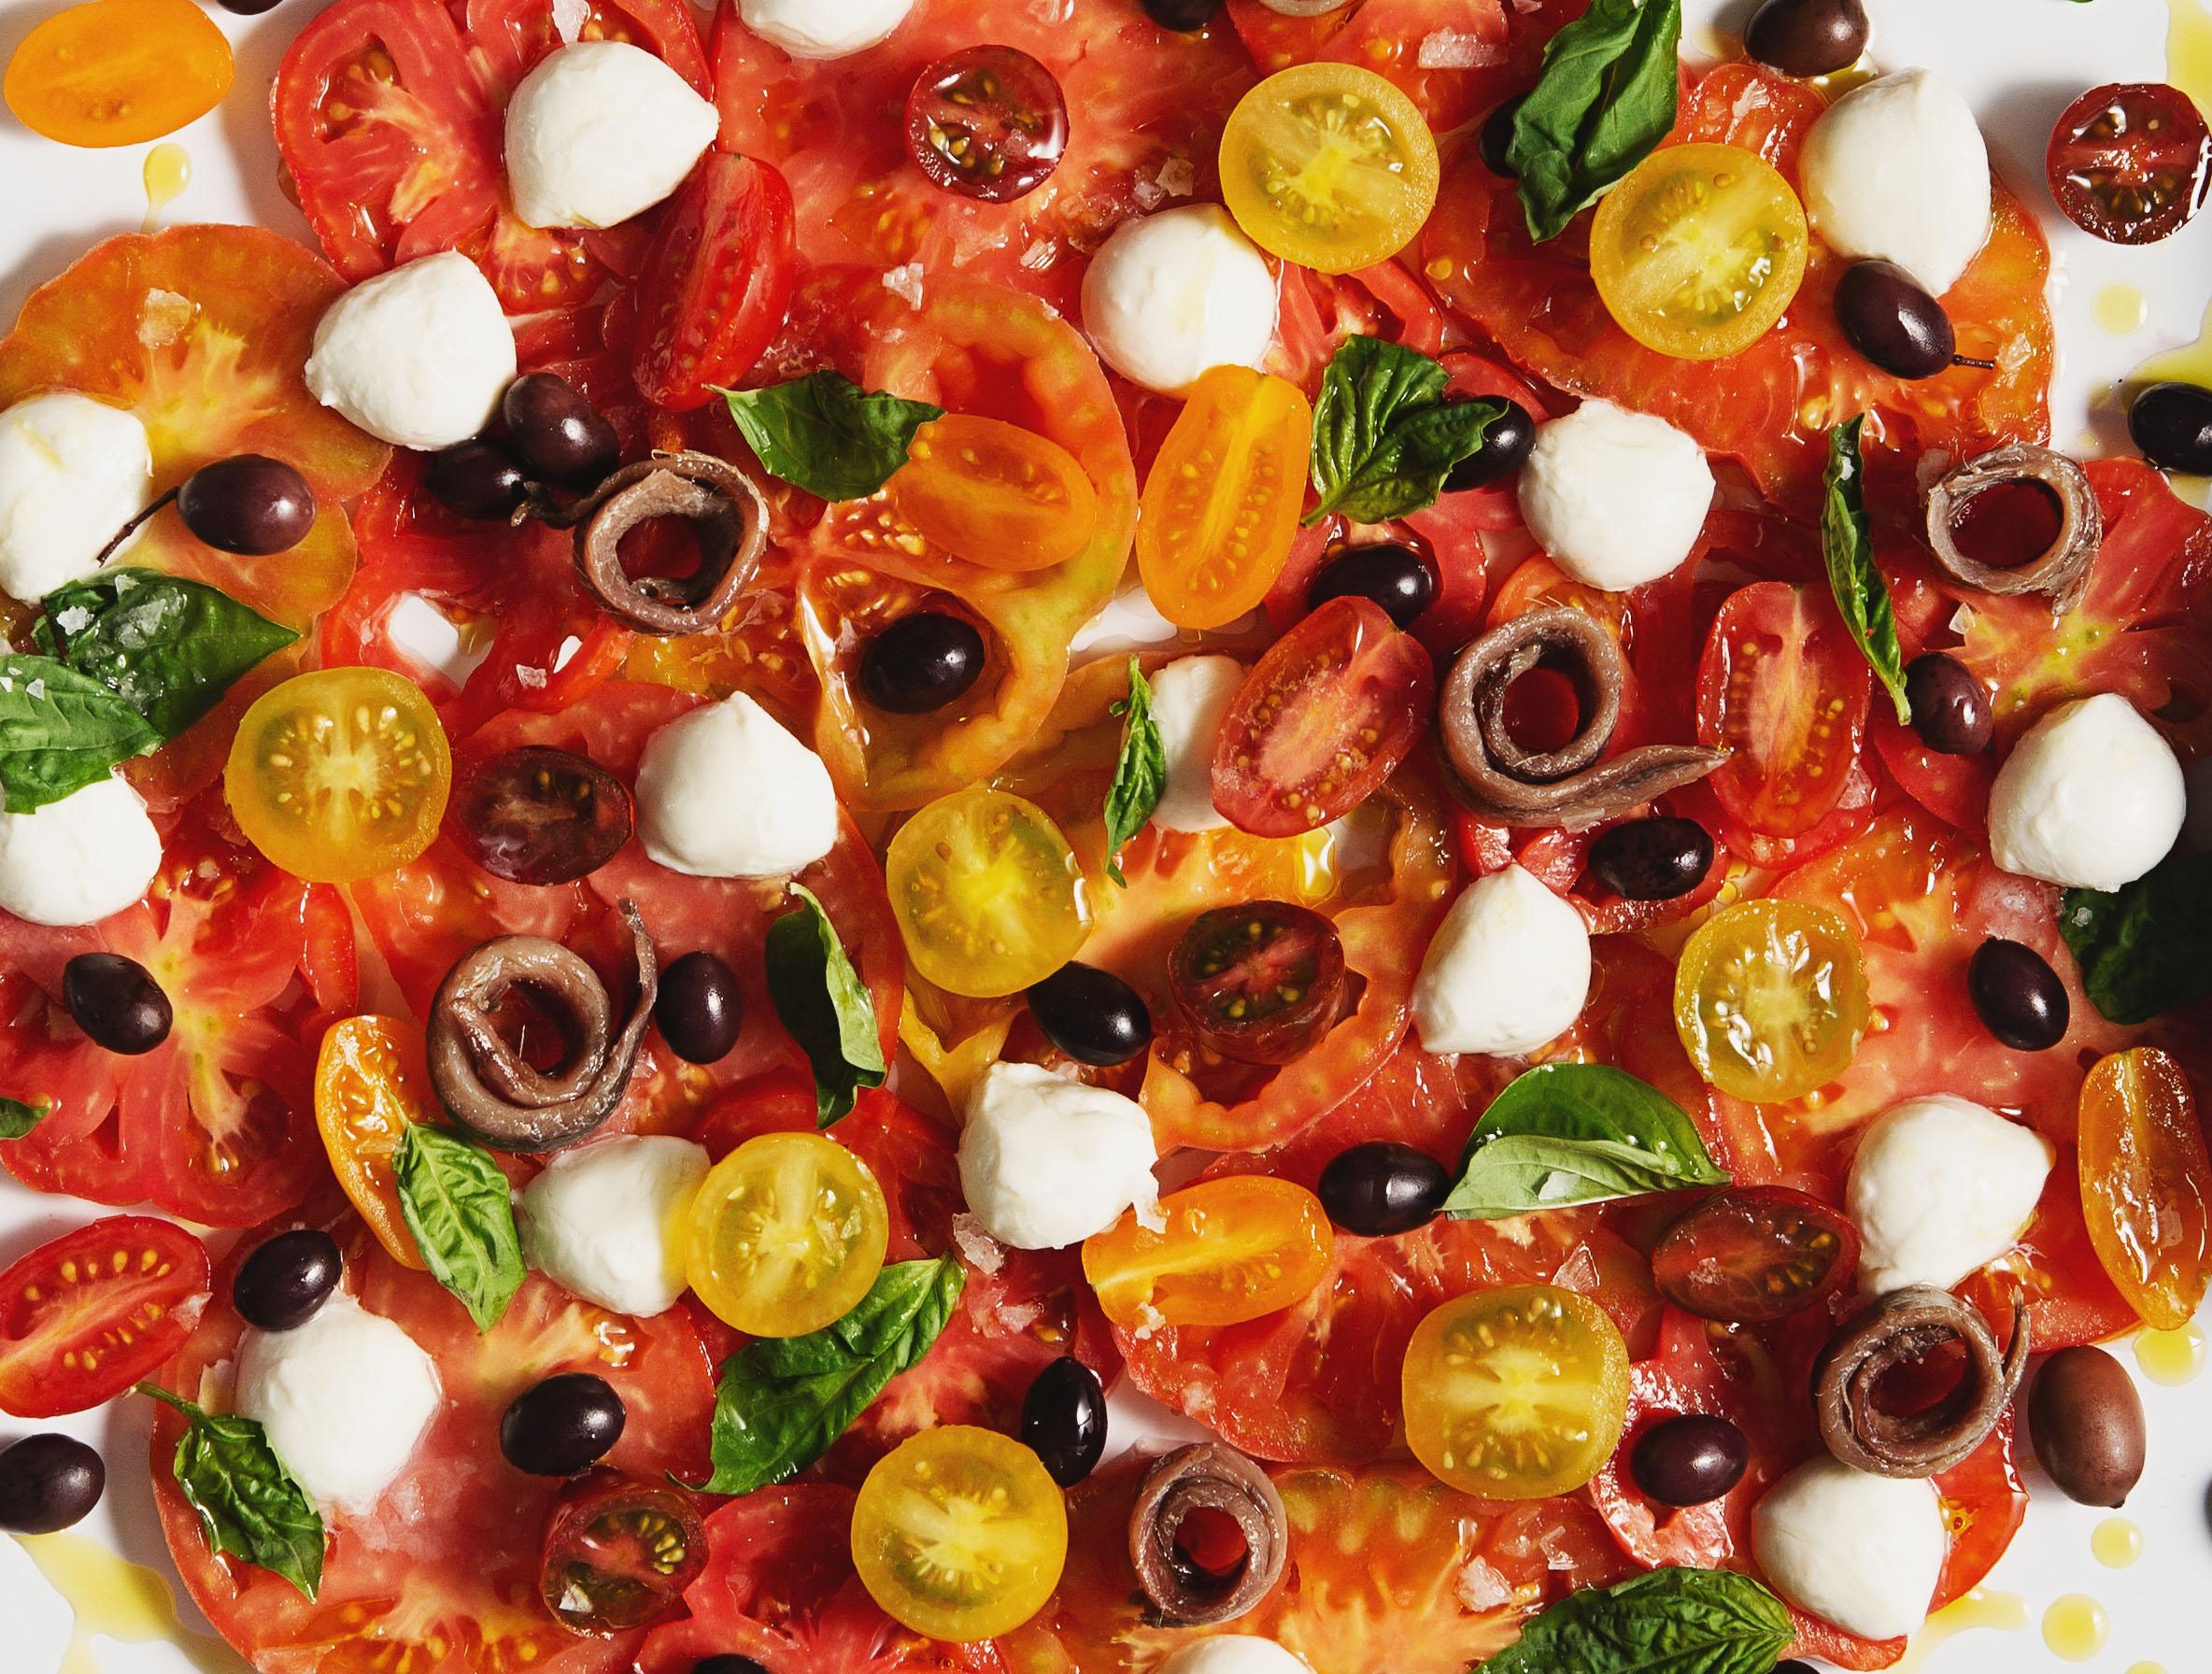 Ensalada de tomate con anchoas y mozzarella regada con agridulce de moscatel con miel de azahar